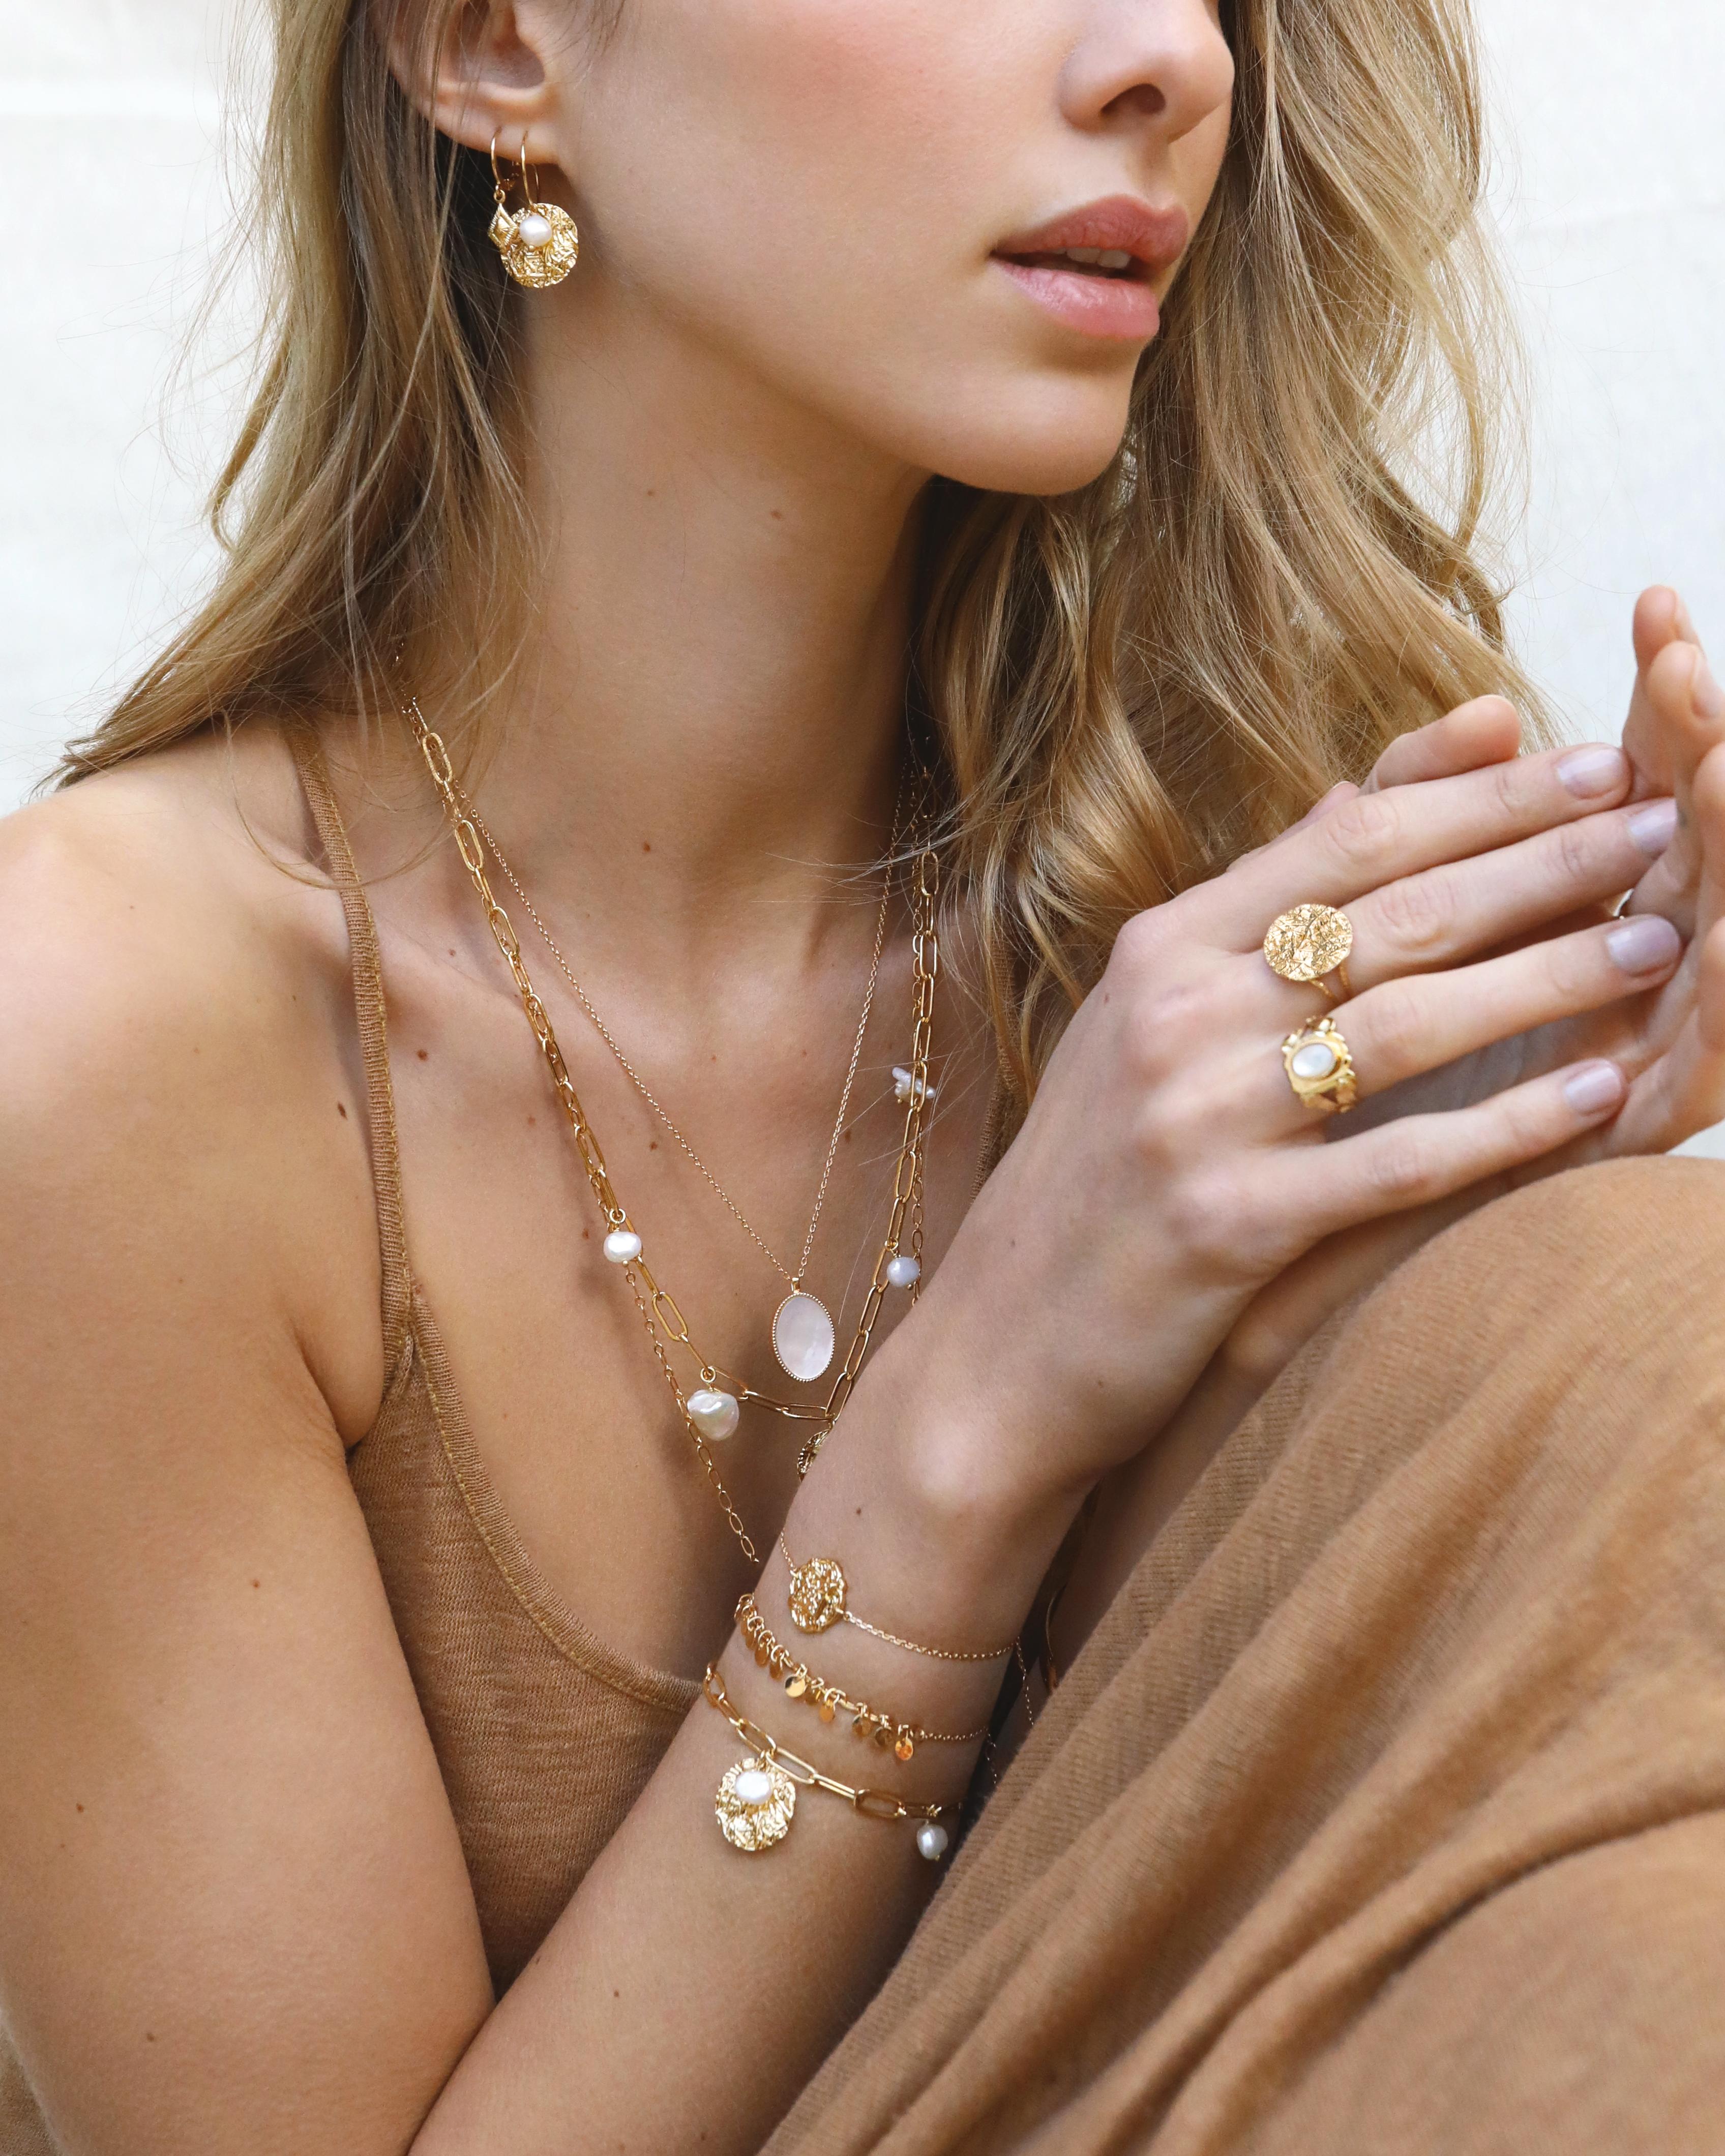 bijoux médaille   bijou doré tendance   Cénélia